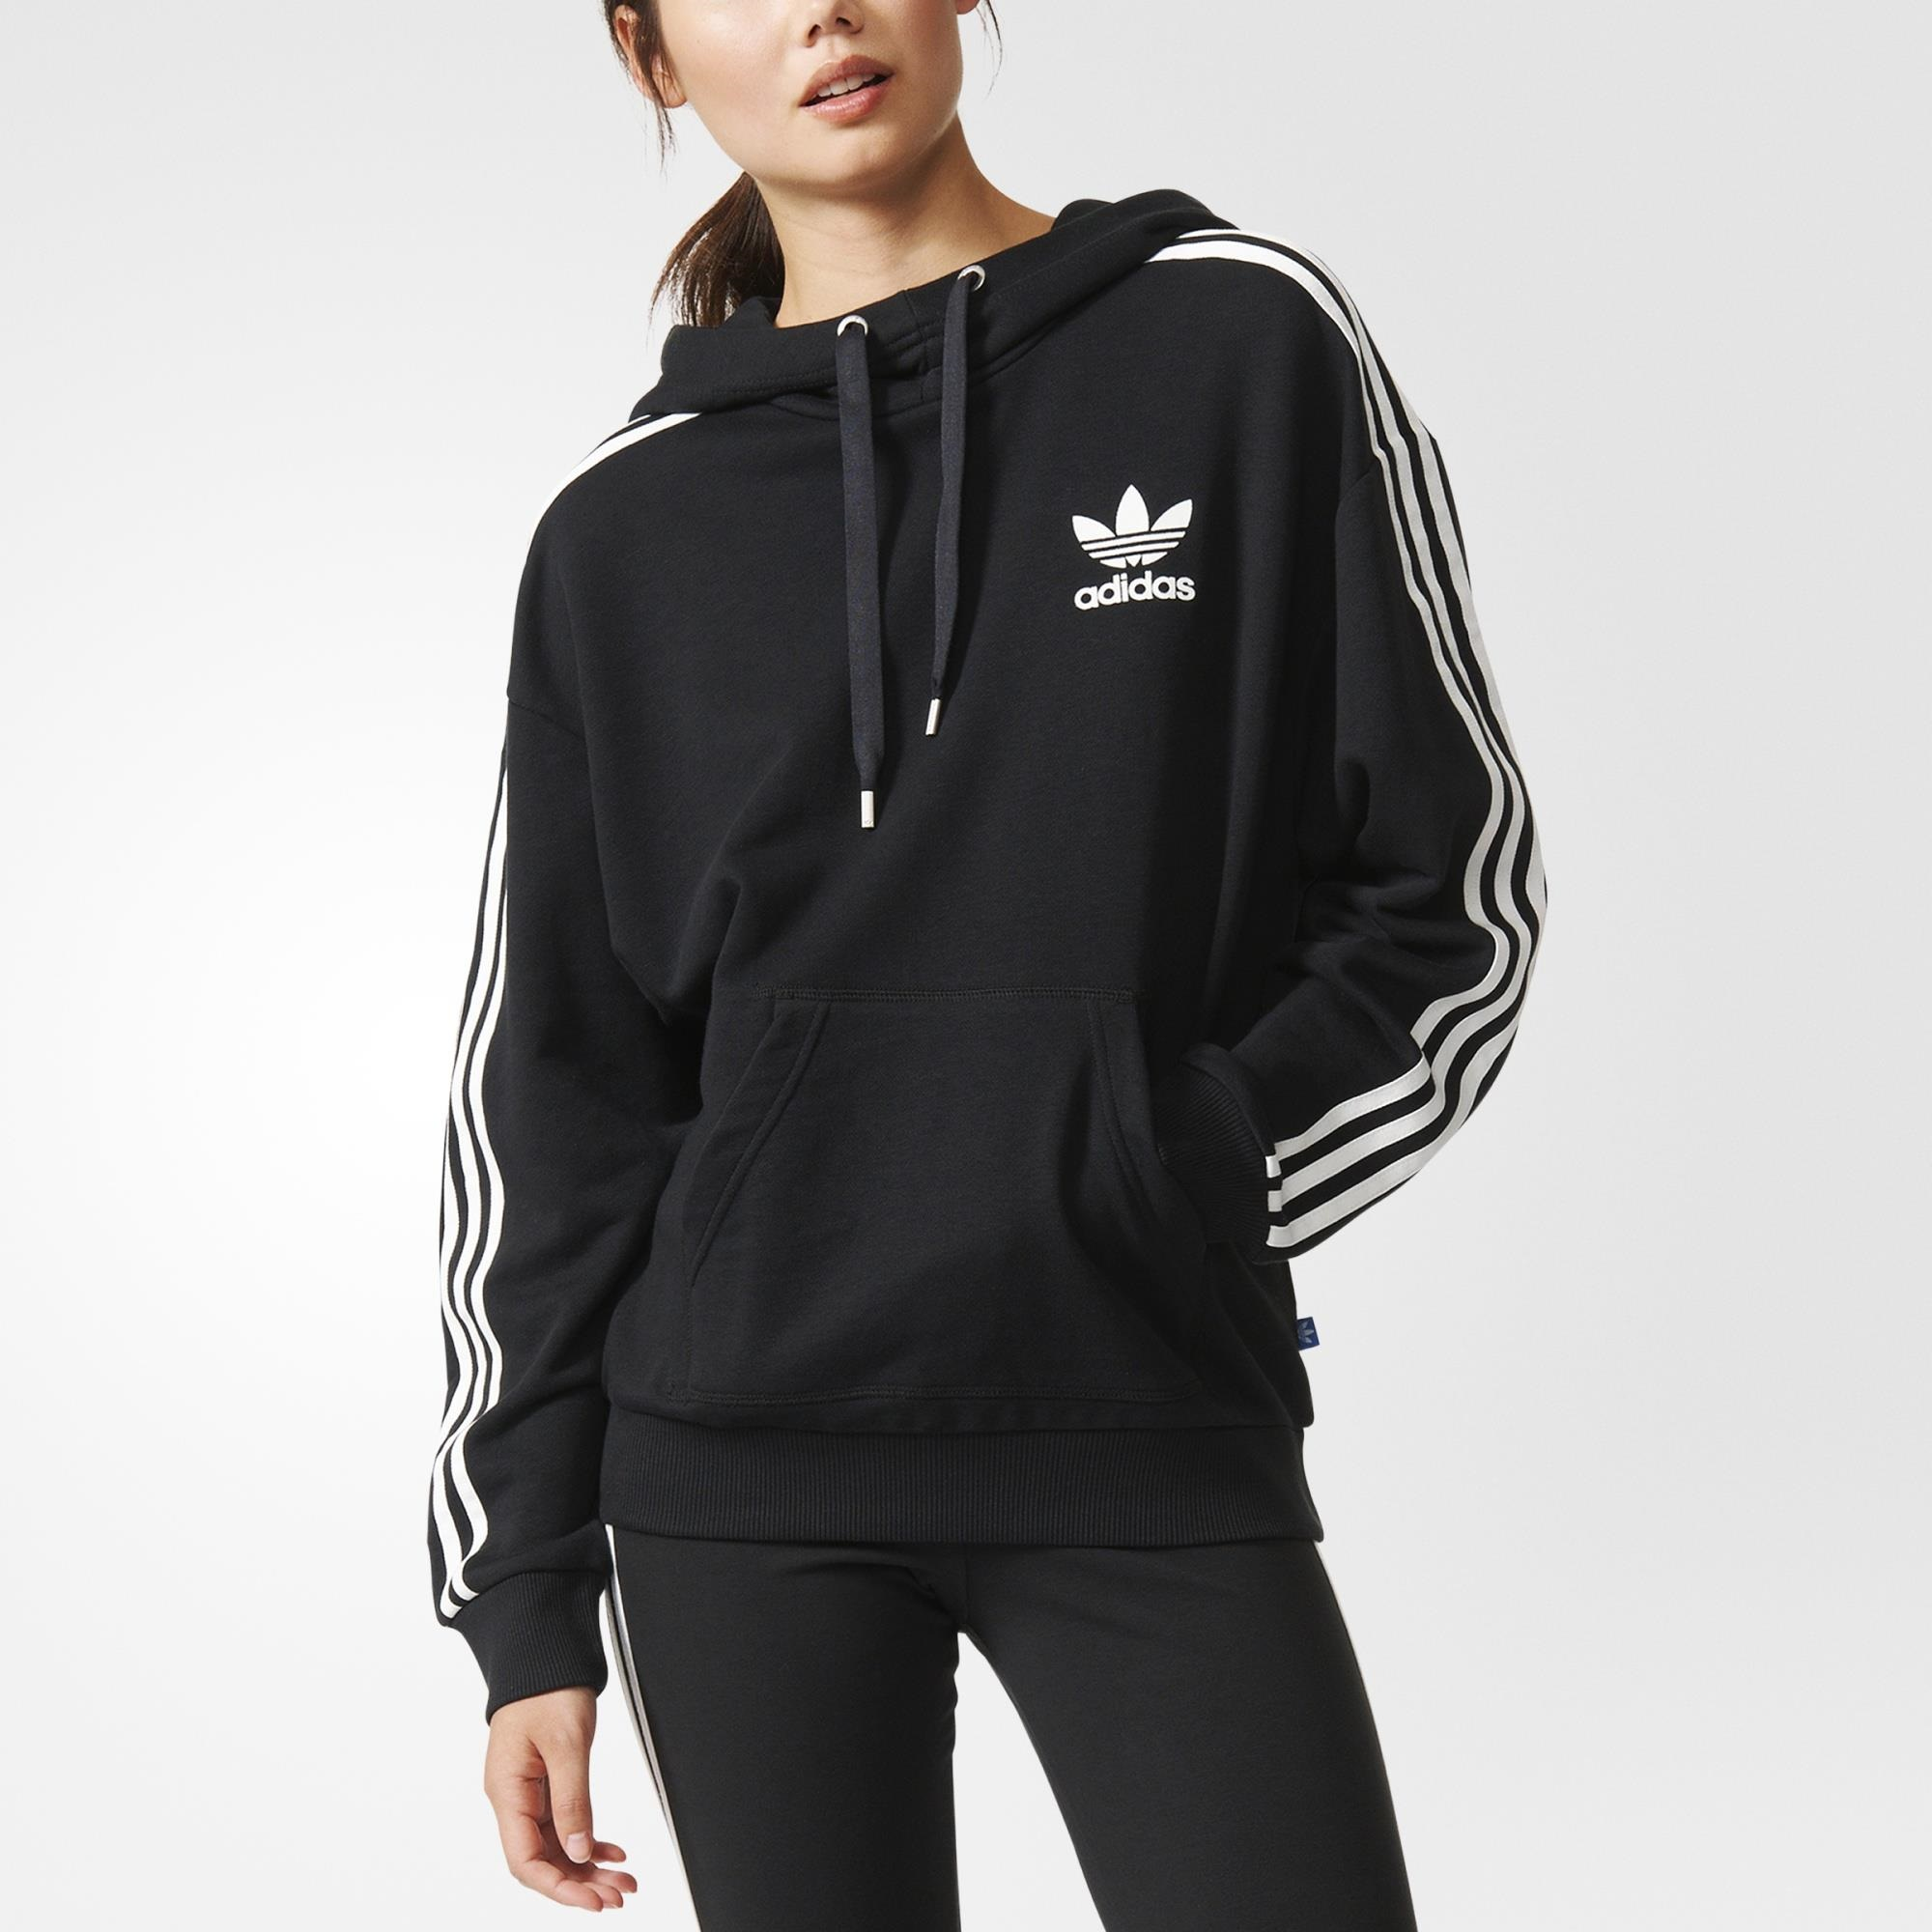 Buy adidas 3 stripe sweatshirt >off54%)